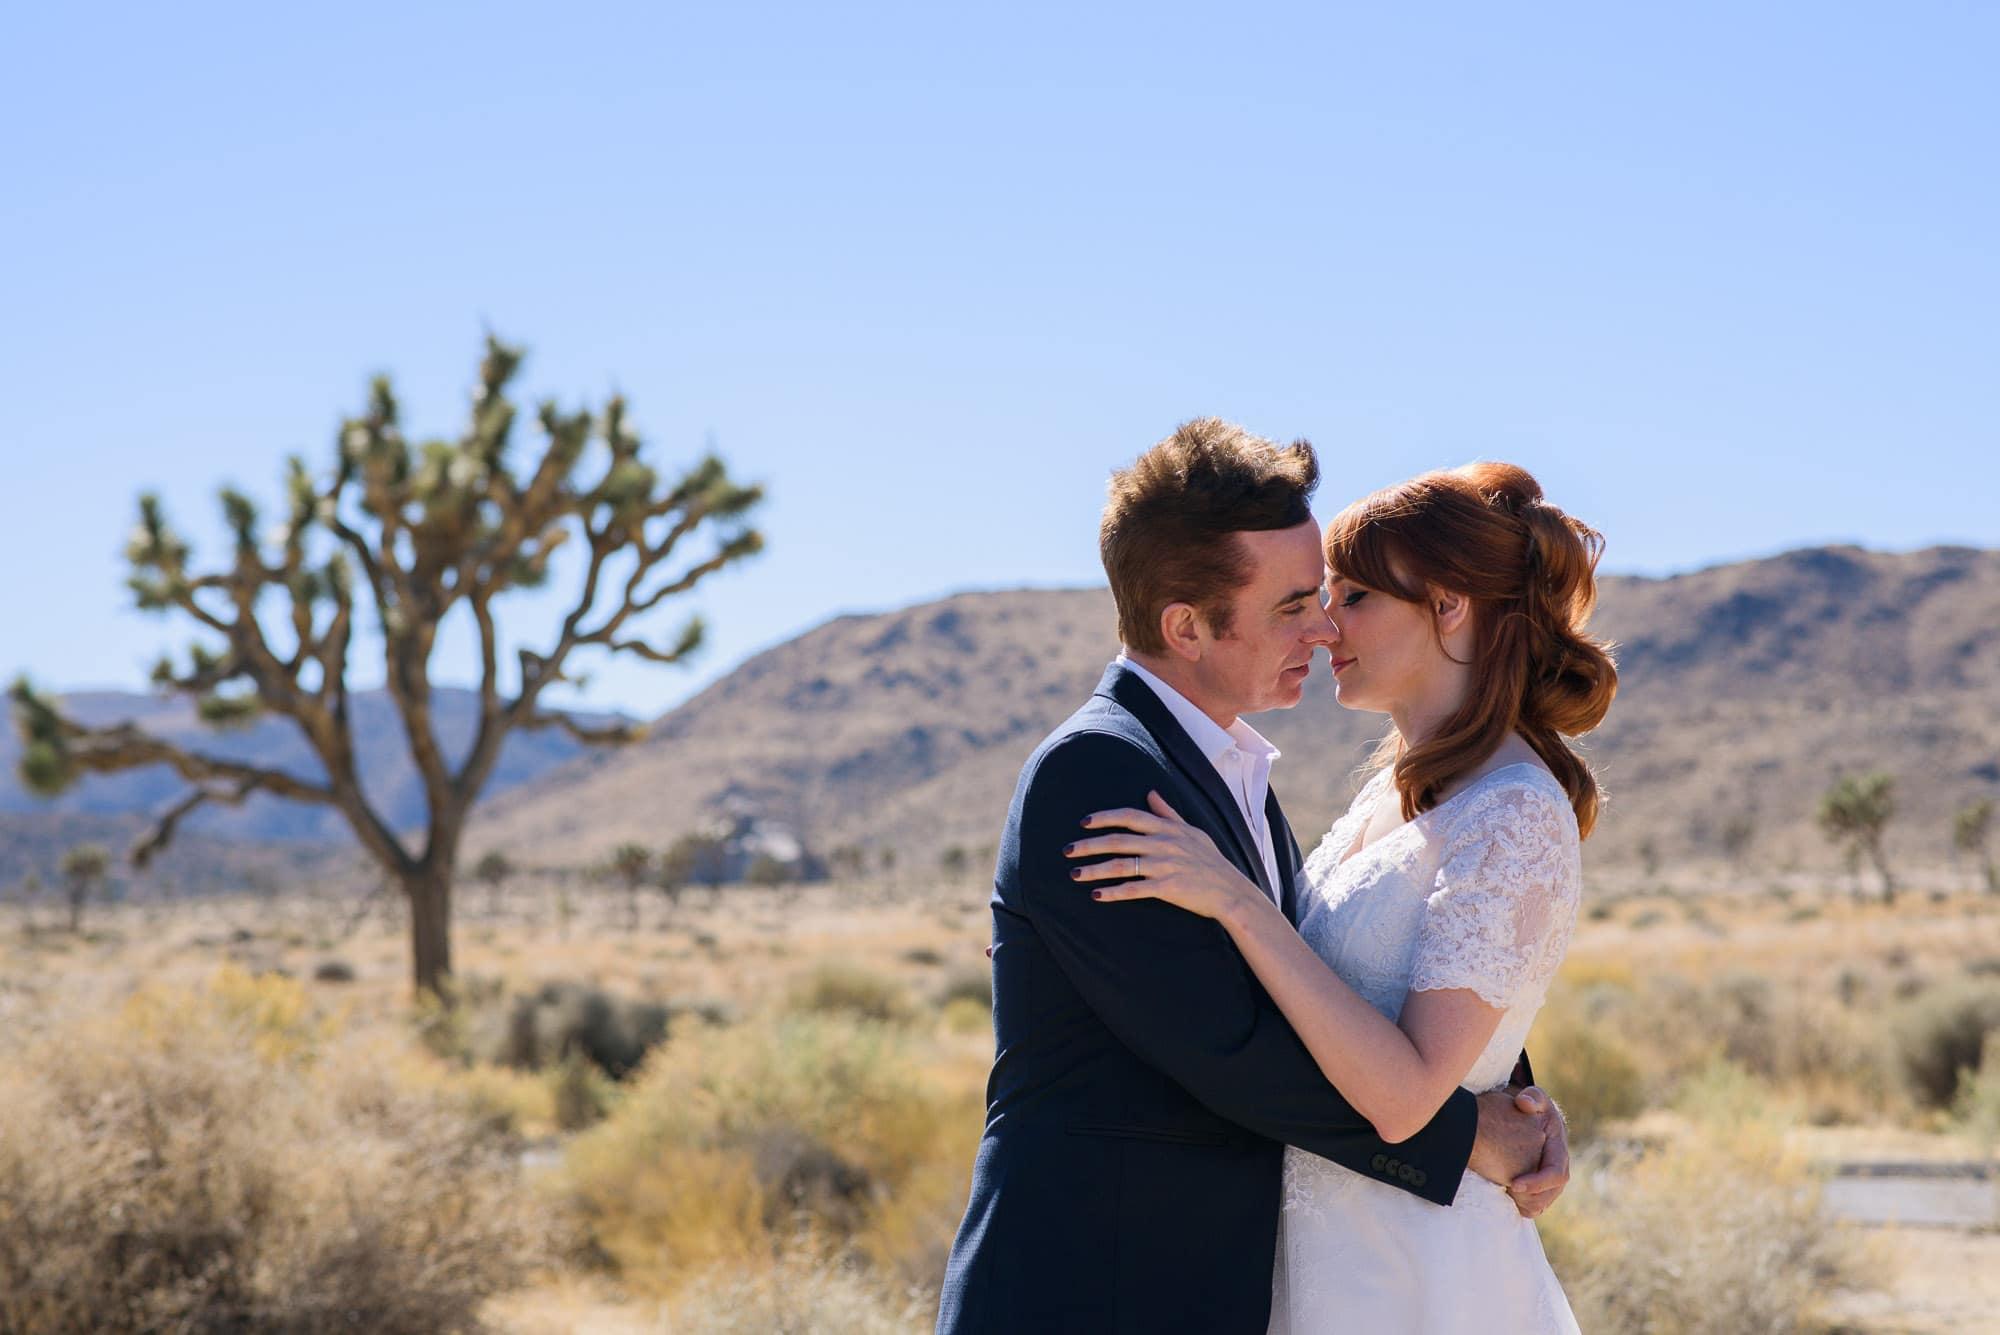 022_Alan_and_Heidi_Joshua_Tree_Destination_Wedding